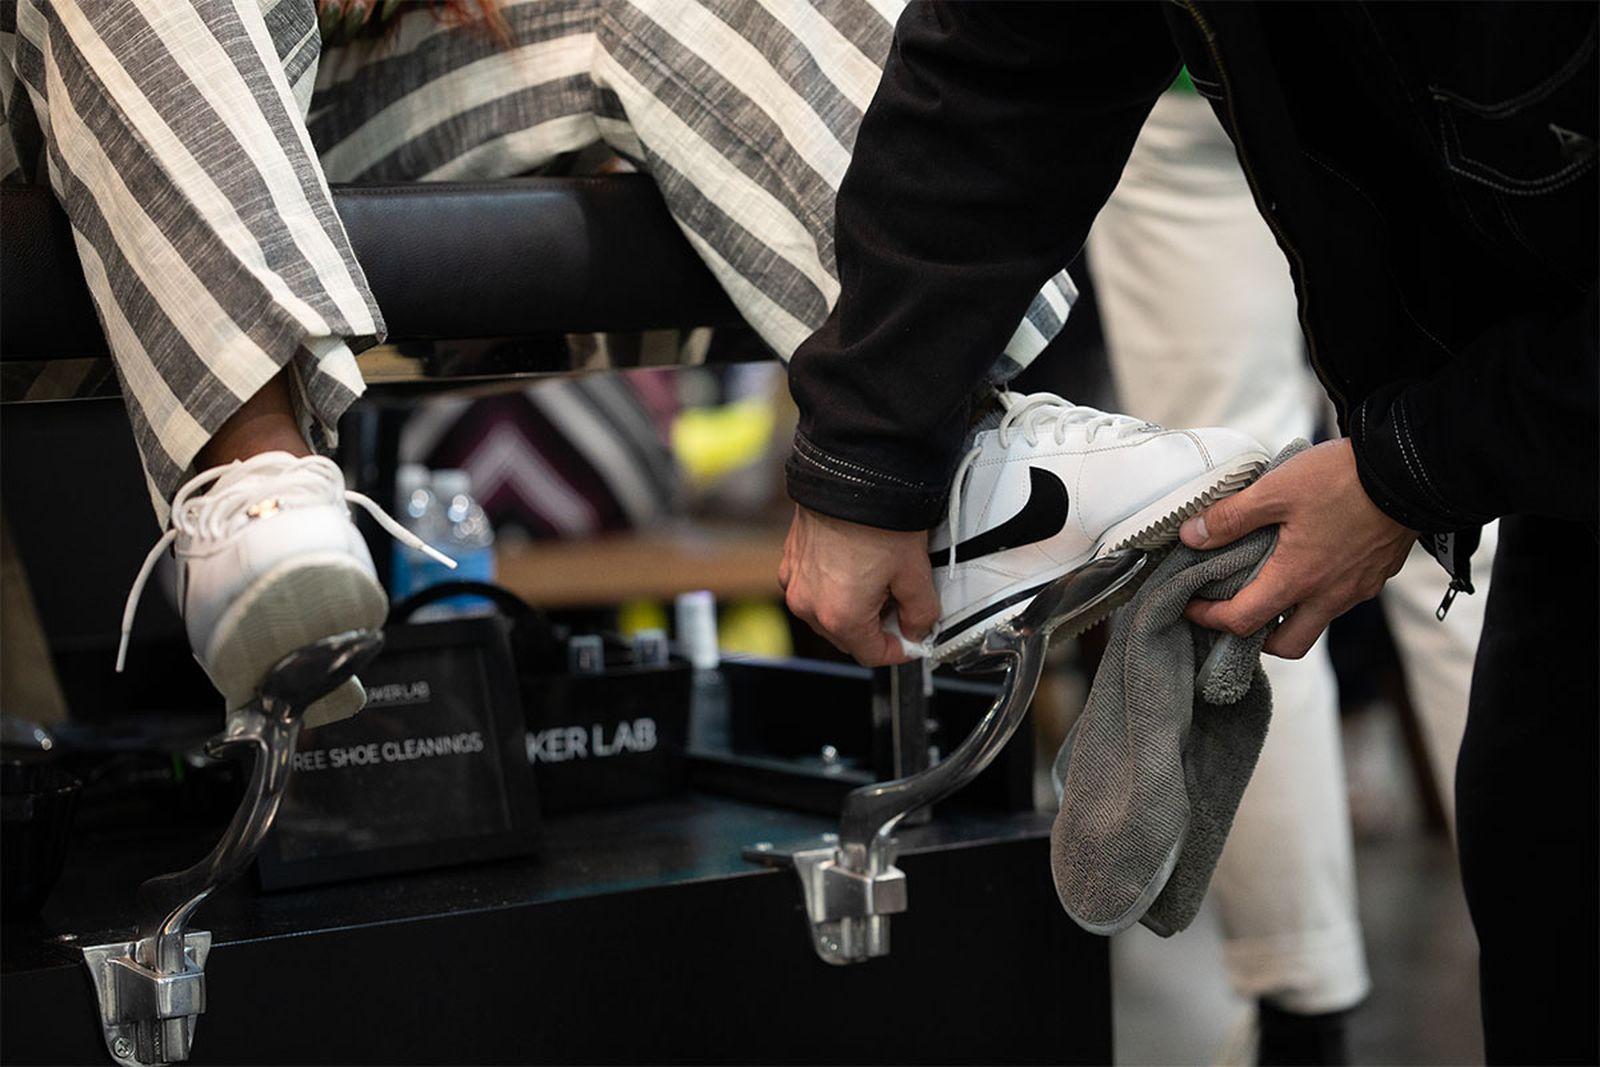 project-show-las-vegas-sneakerlab-01